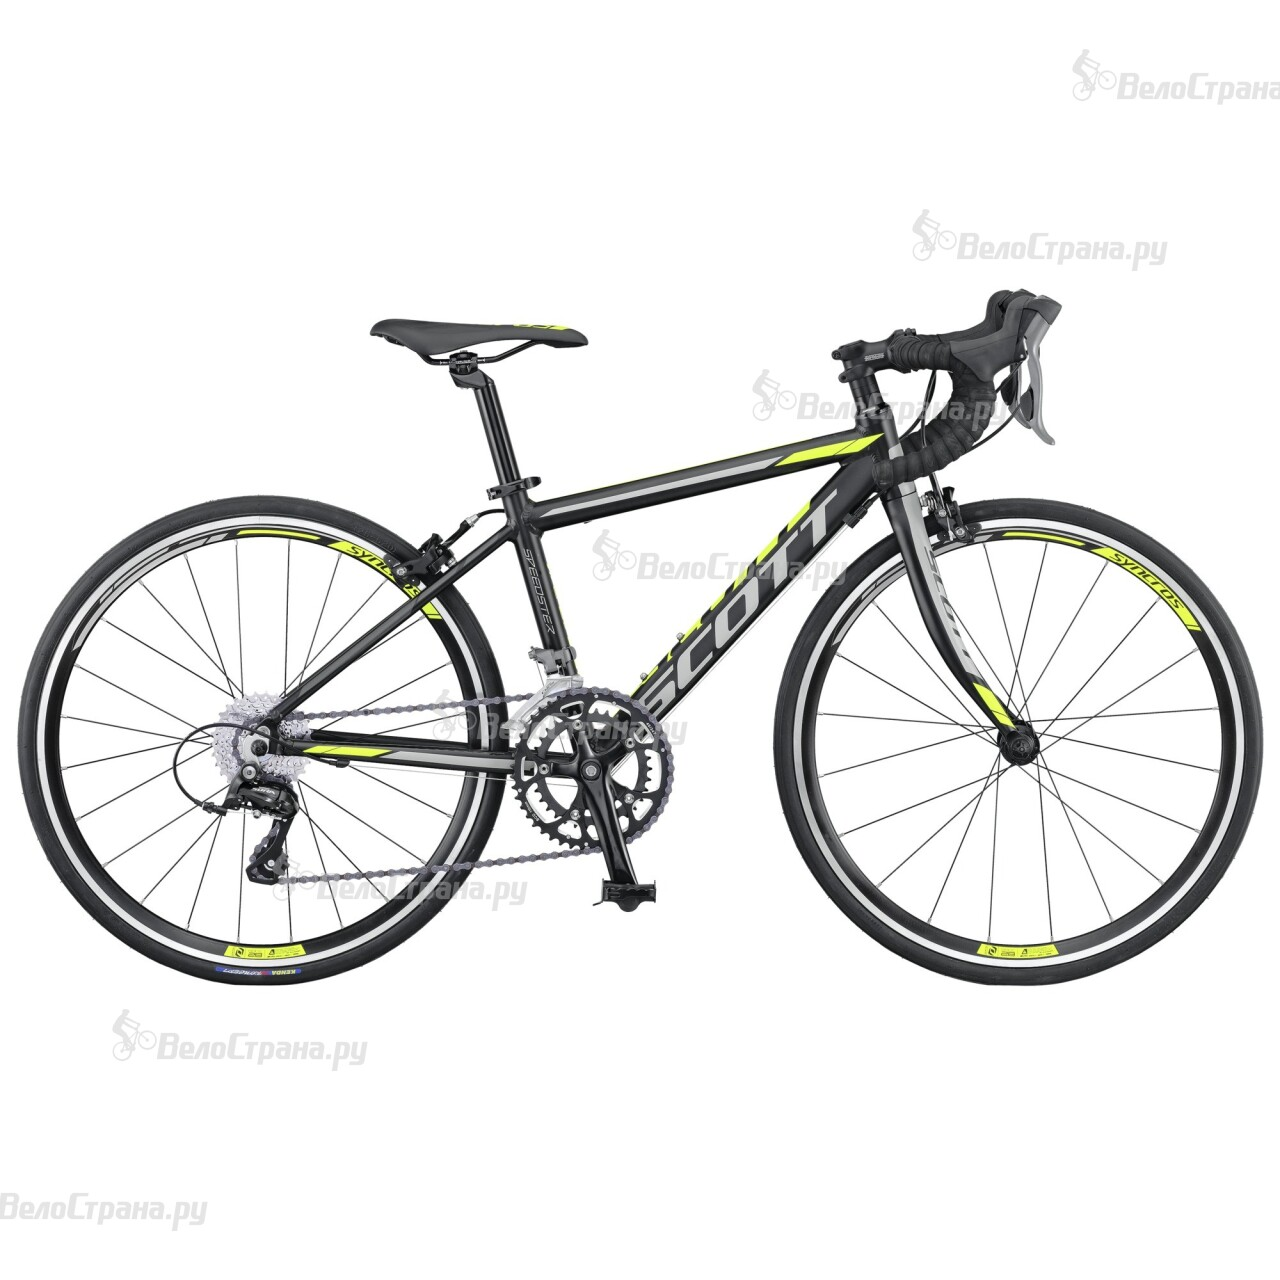 Велосипед Scott Speedster JR 24 (2016) велосипед scott speedster 30 disc 2016